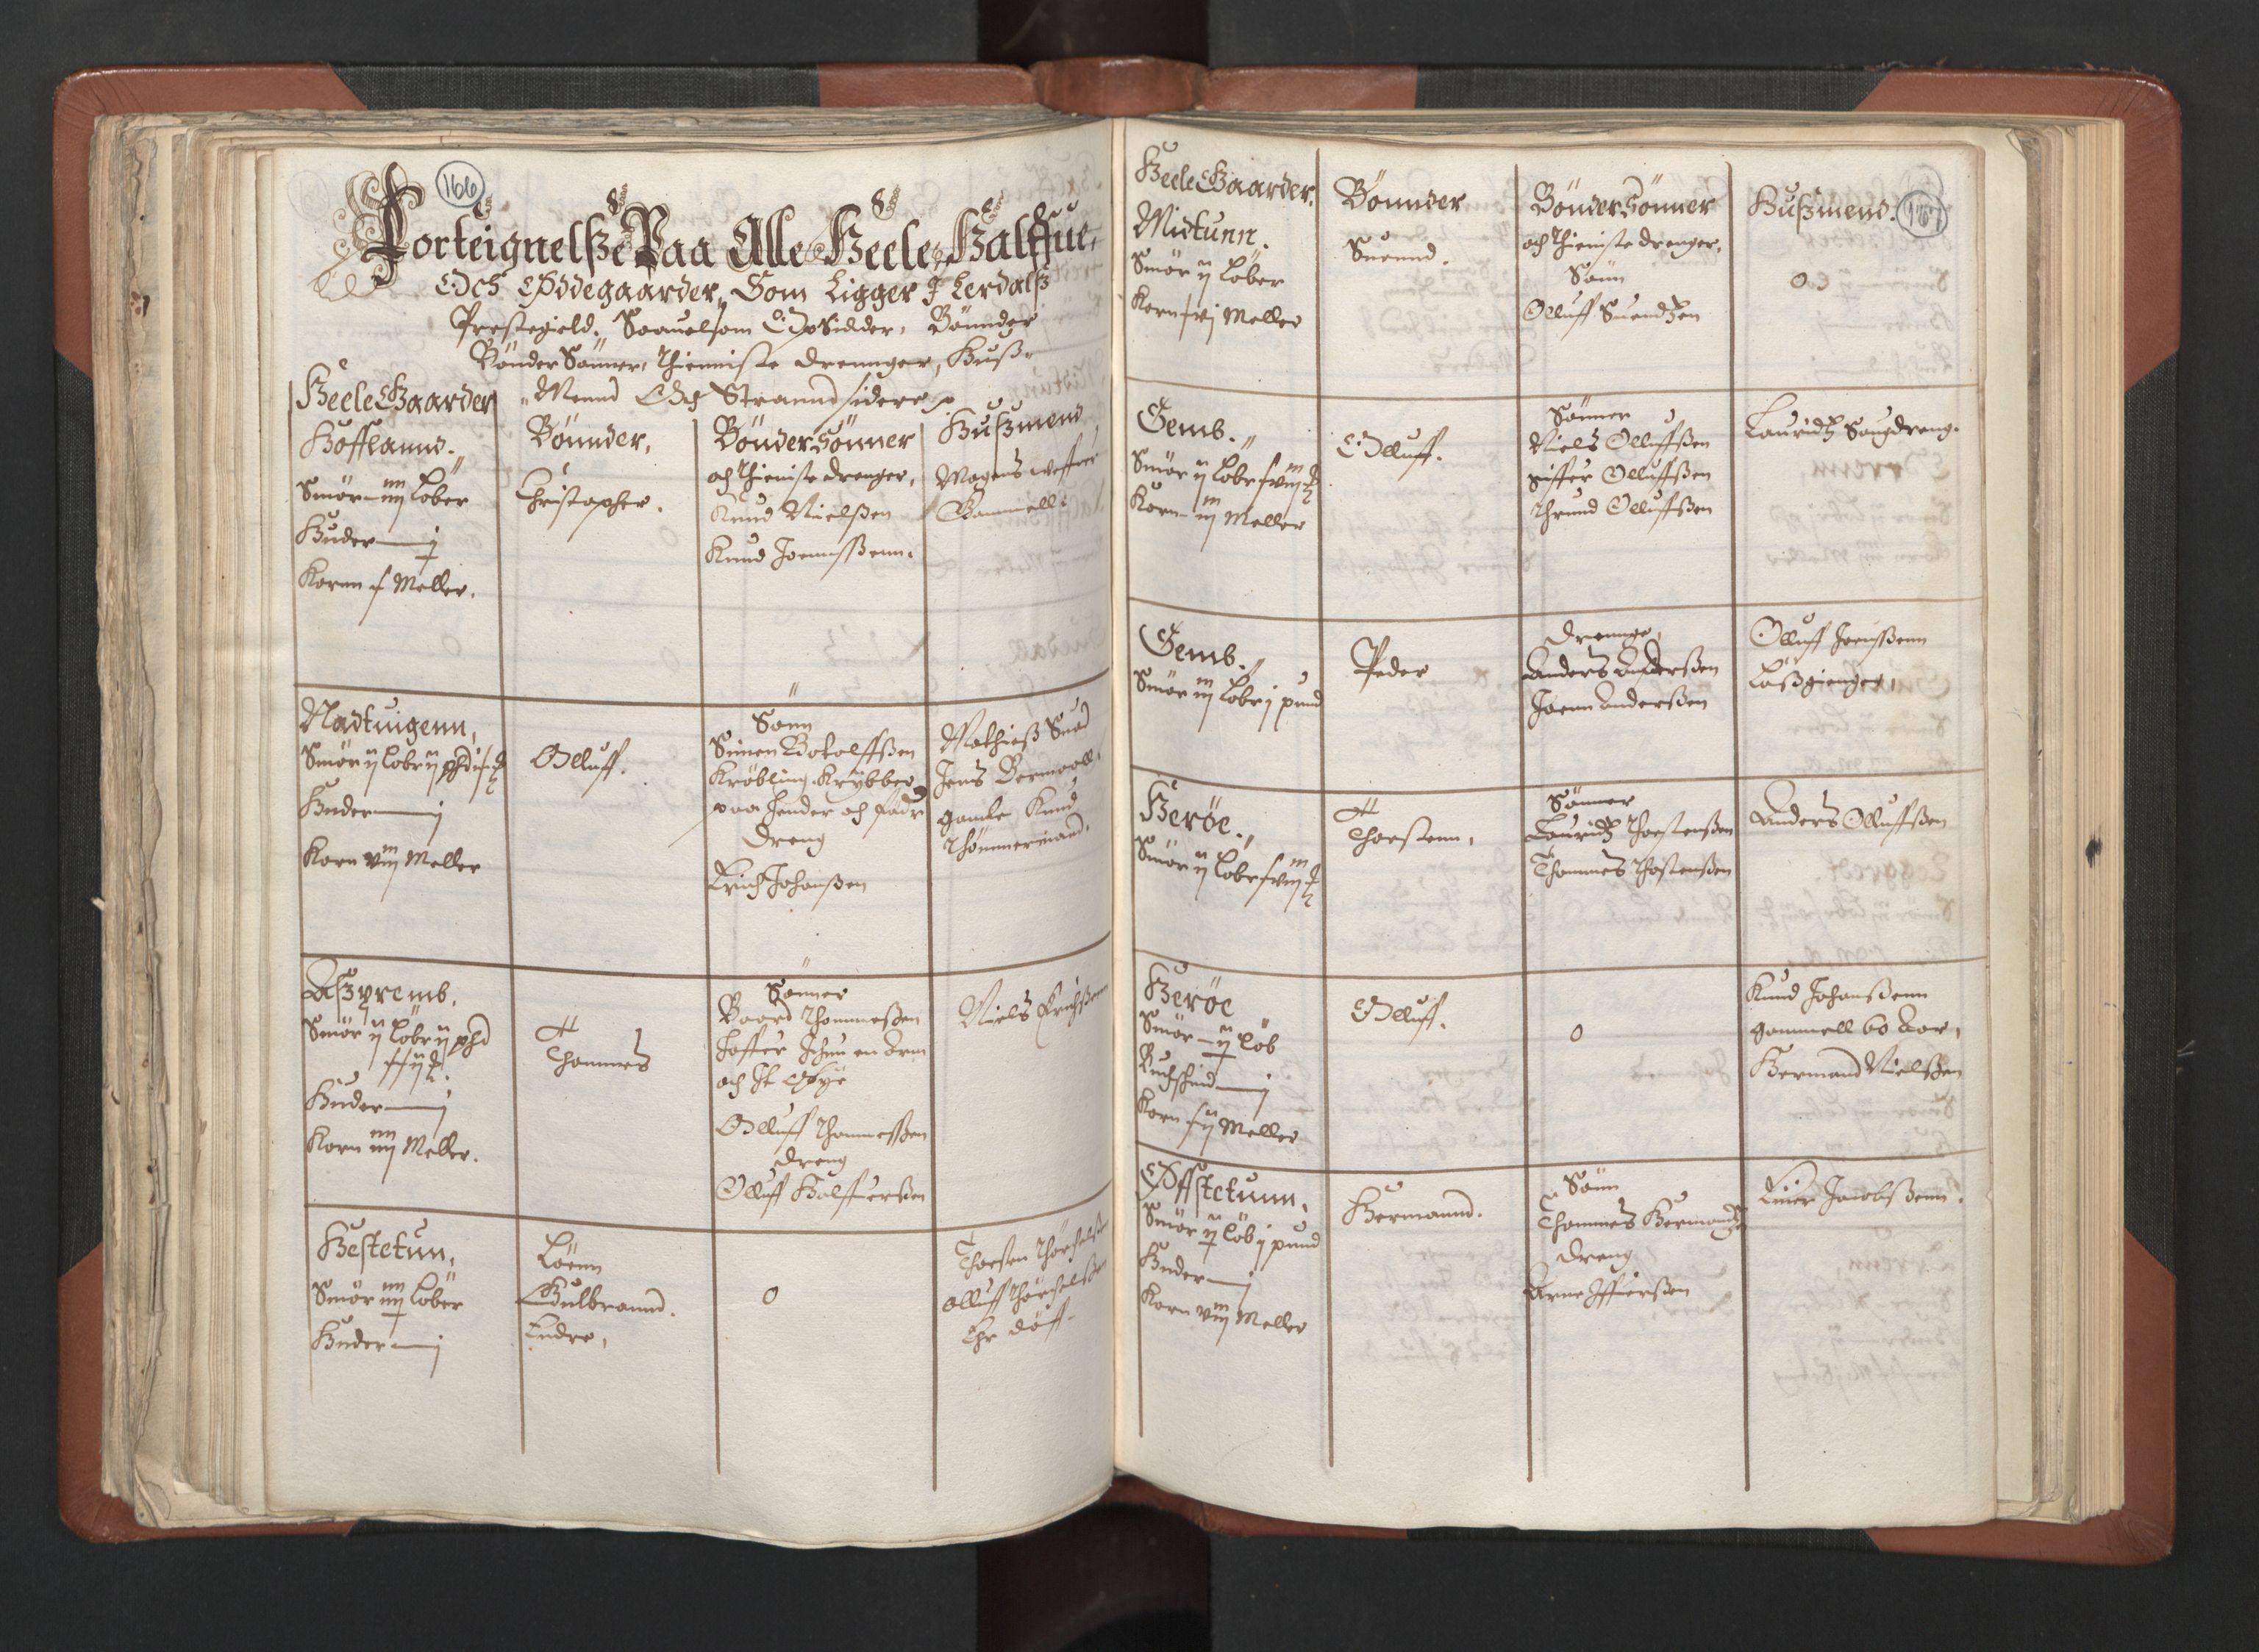 RA, Fogdenes og sorenskrivernes manntall 1664-1666, nr. 14: Hardanger len, Ytre Sogn fogderi og Indre Sogn fogderi, 1664-1665, s. 166-167